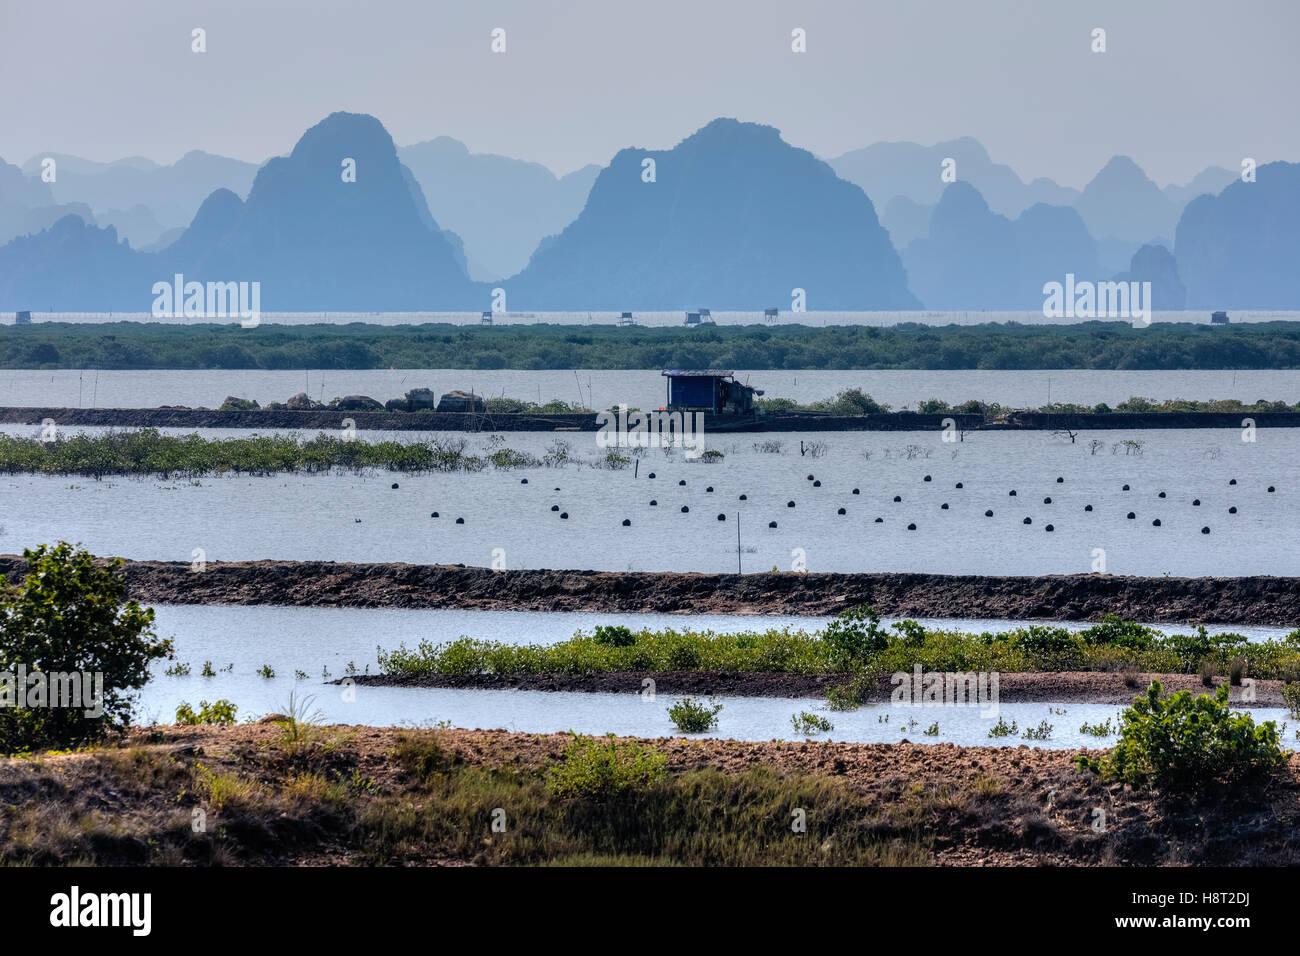 pearl farm at Halong Bay, Vietnam, Indochina, Asia - Stock Image